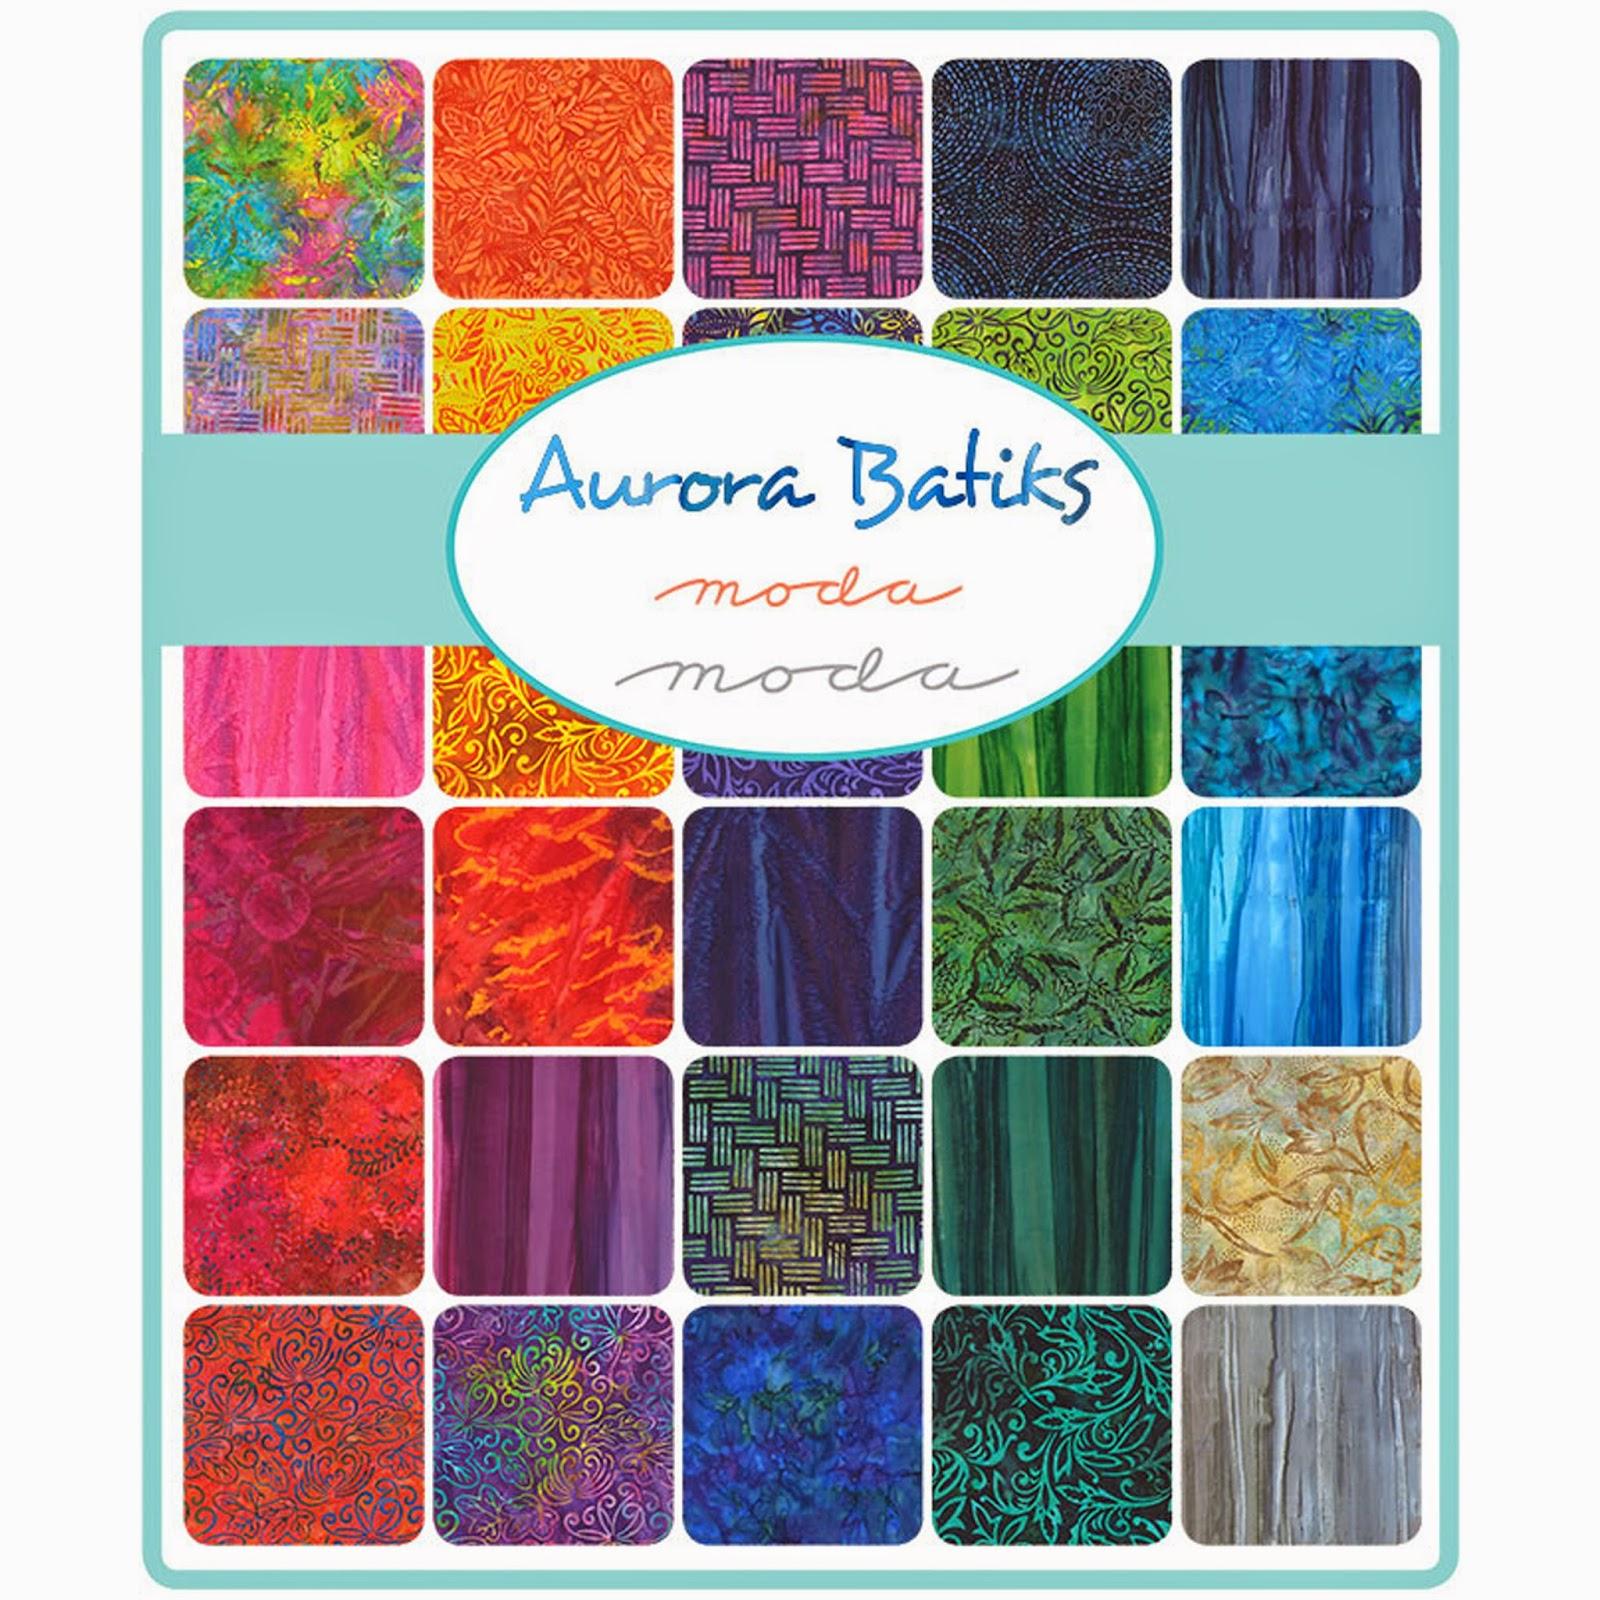 Moda AURORA BATIKS Fabric by Moda Fabrics